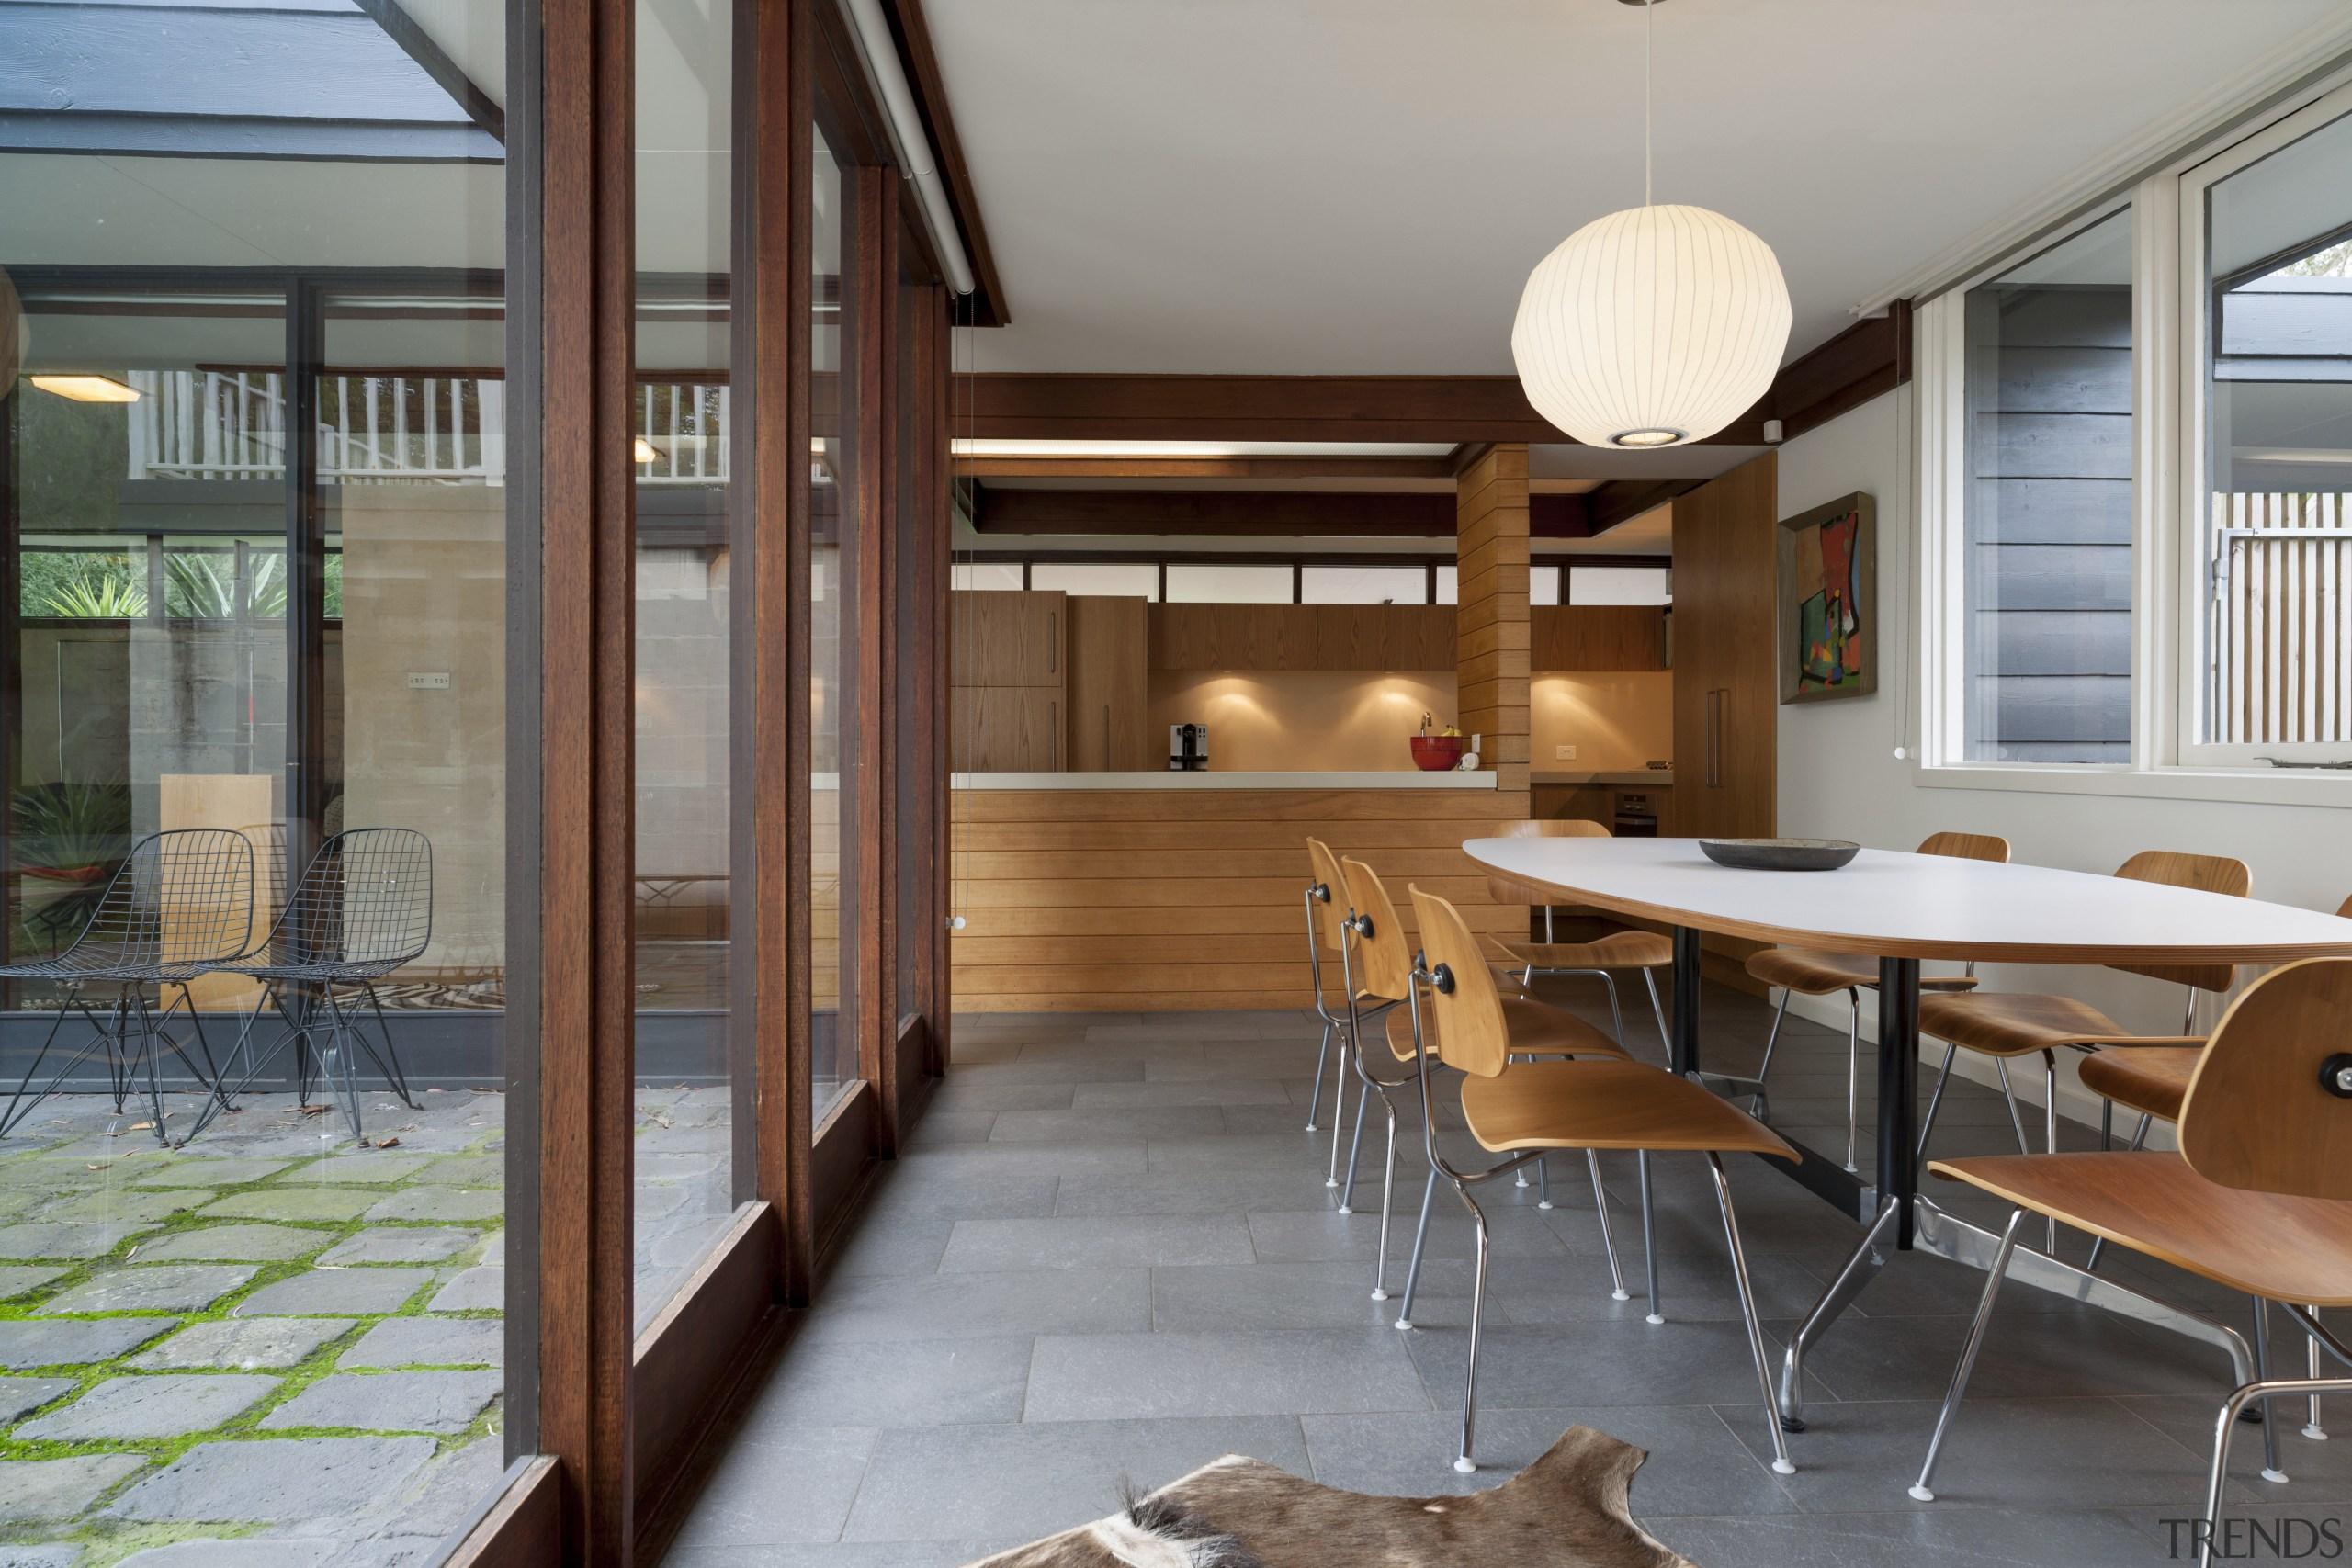 All the cabinets are American oak veneer, except architecture, house, interior design, real estate, gray